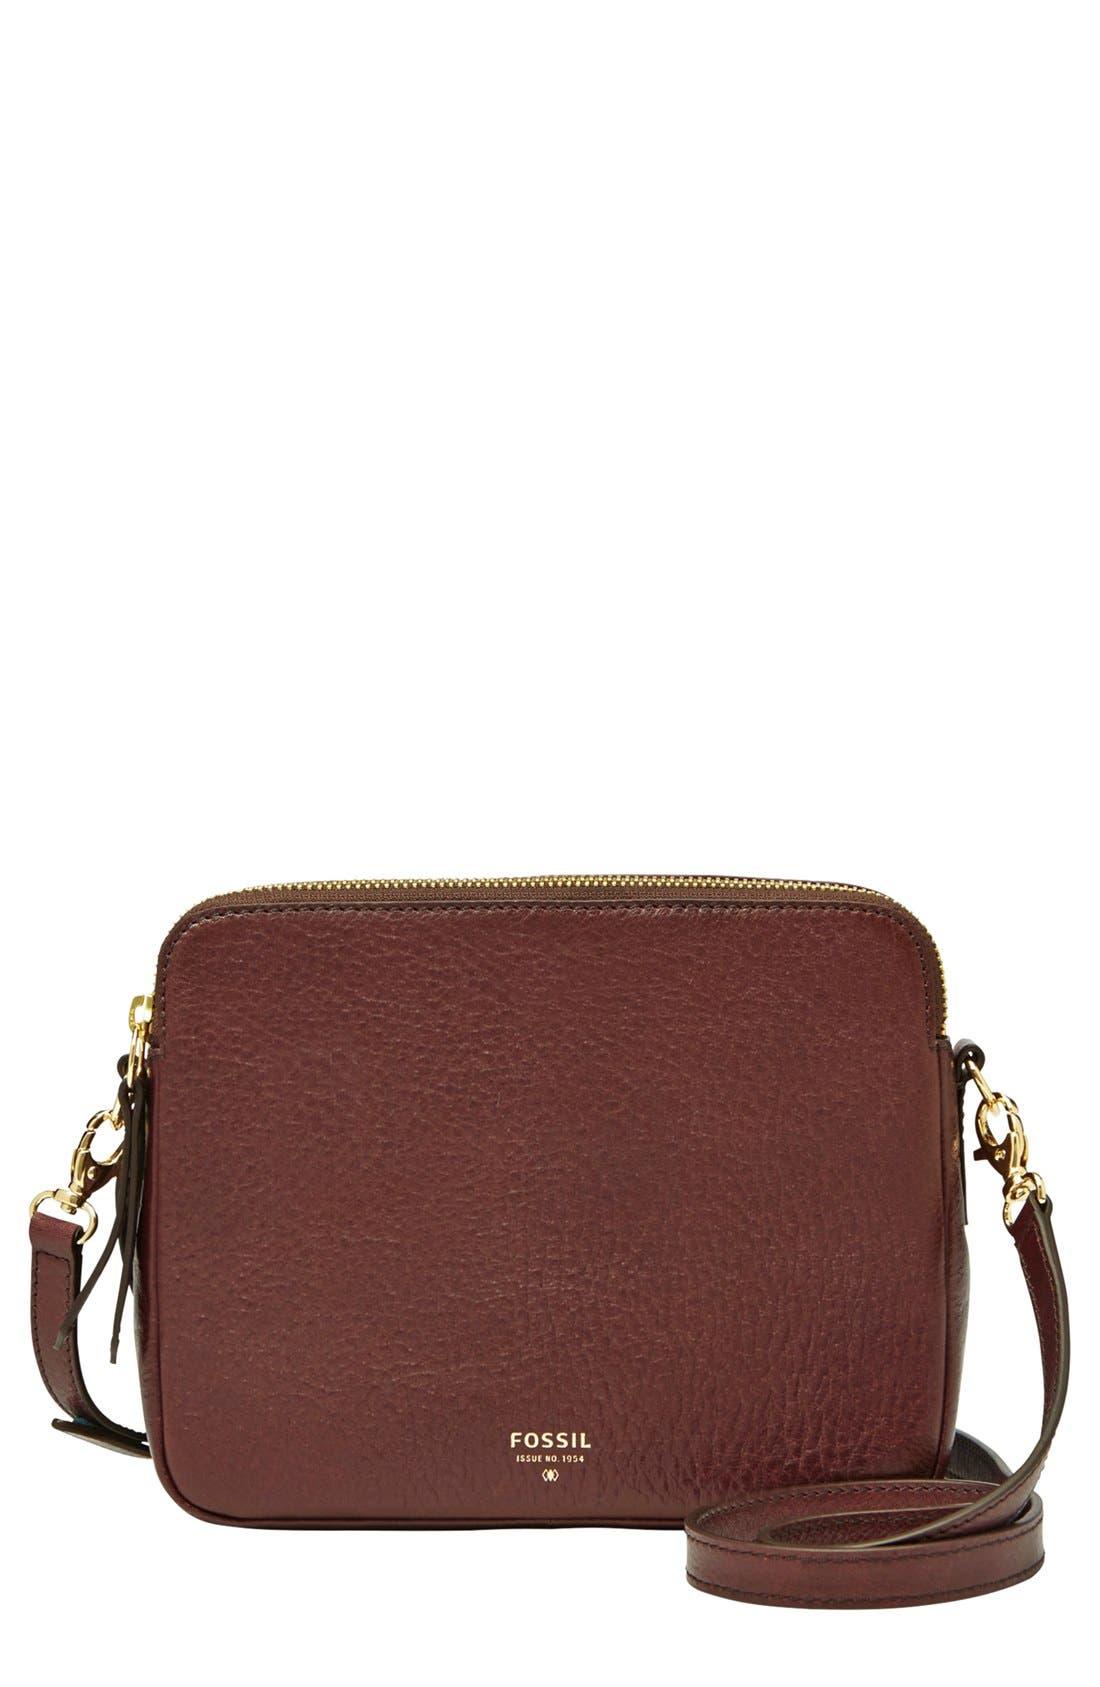 Main Image - Fossil 'Sydney' Leather Crossbody Bag